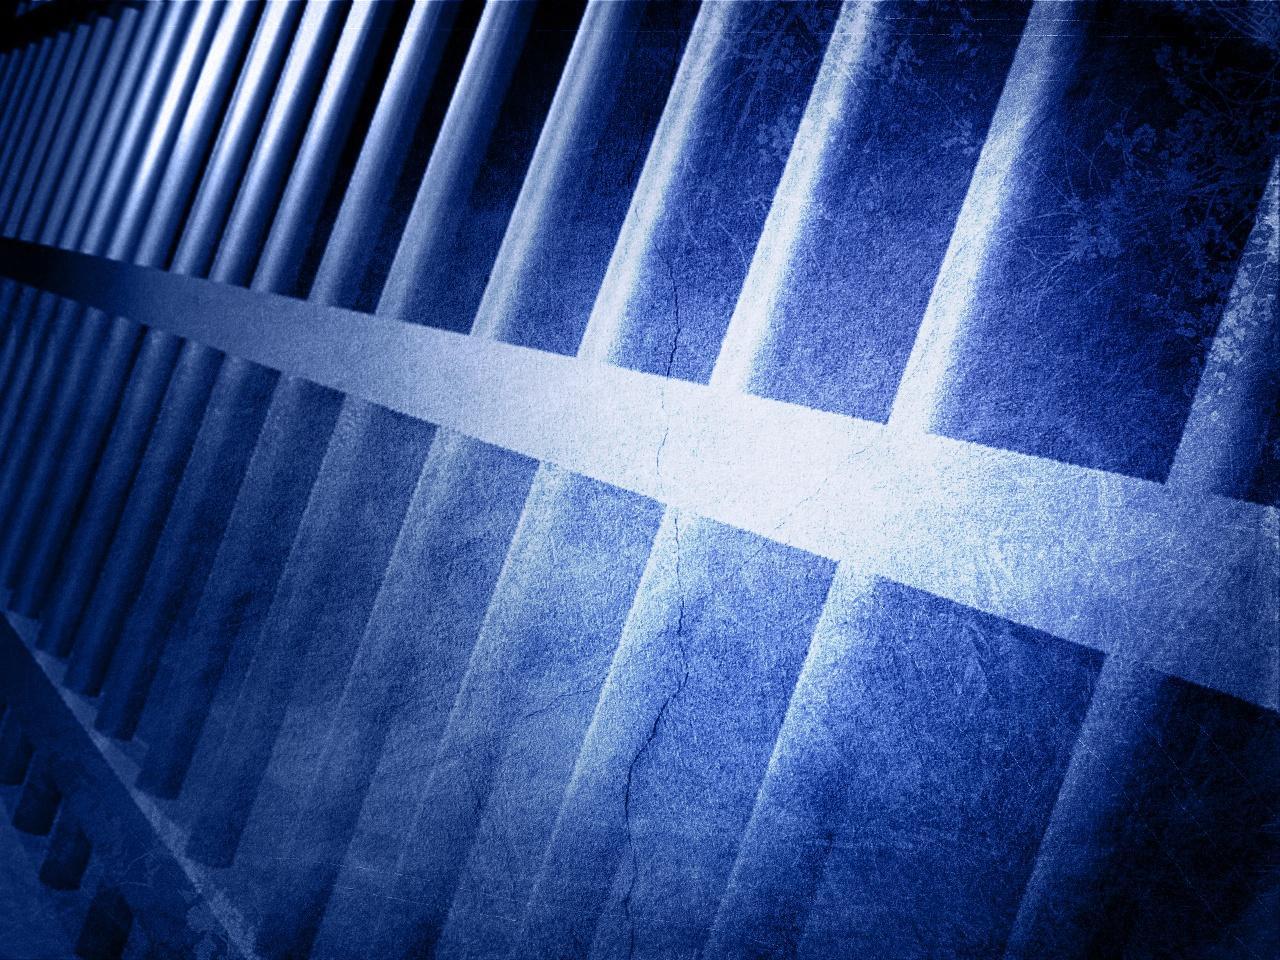 jail_prison_1544120886635.jpg